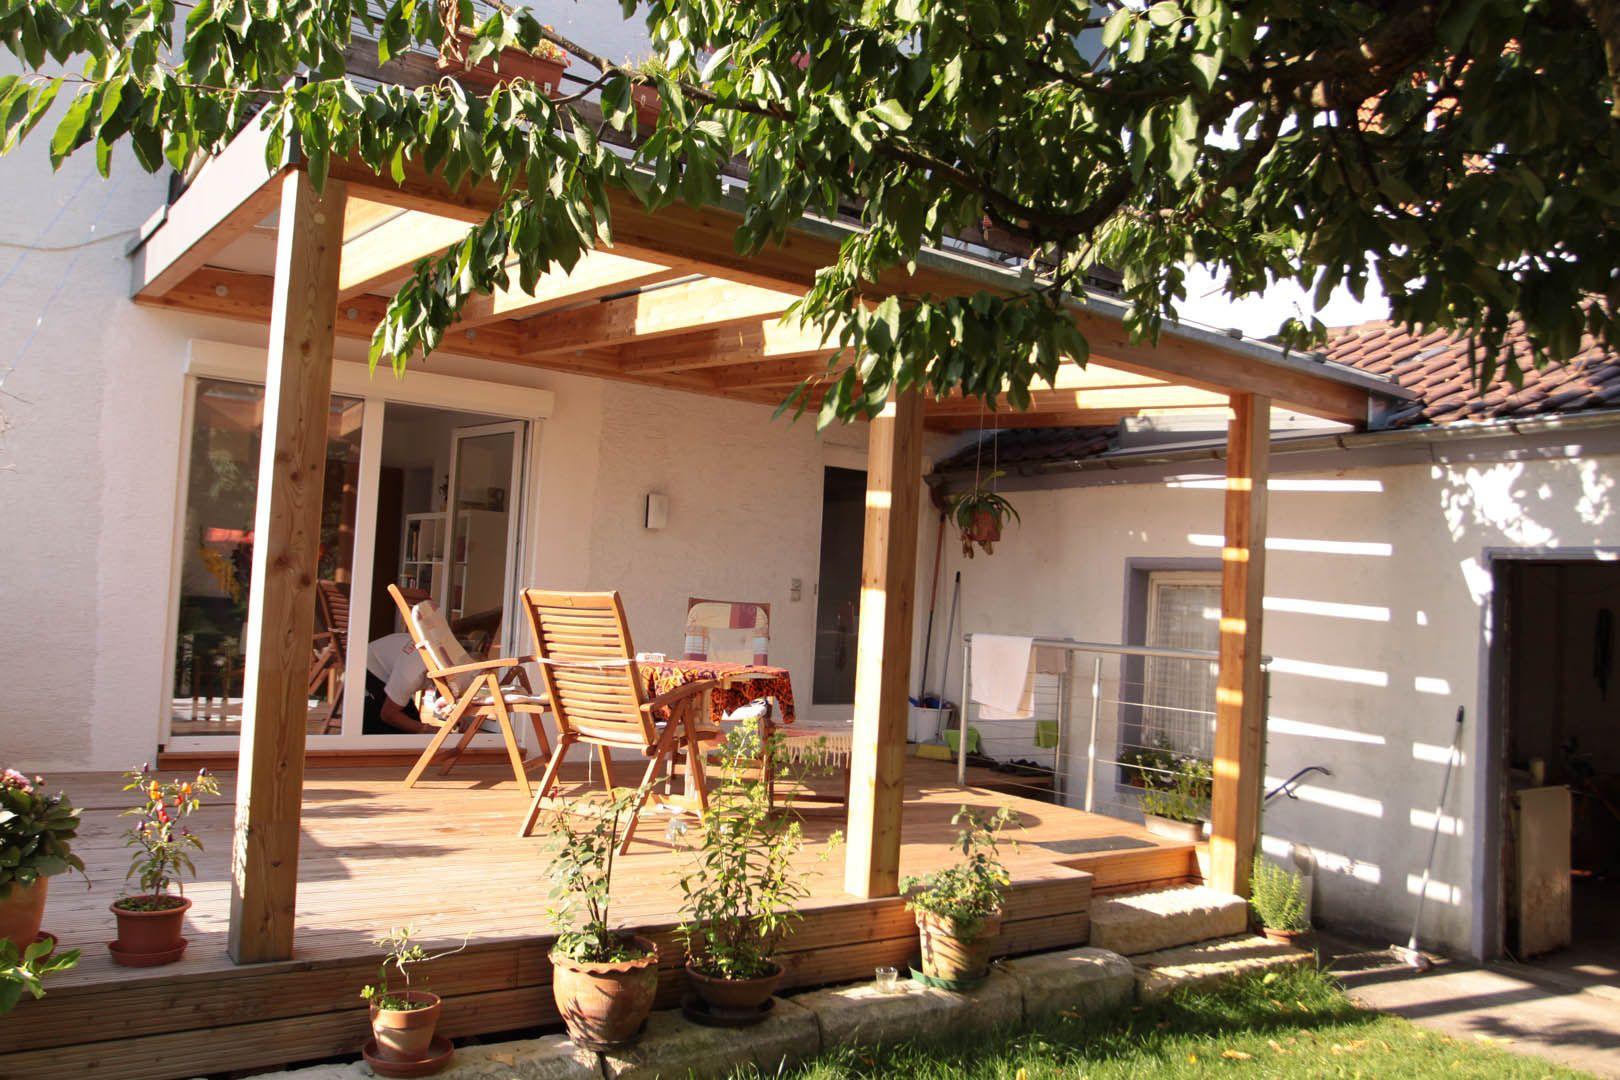 holz terrasse mit glas berdachung veranda aus holz. Black Bedroom Furniture Sets. Home Design Ideas